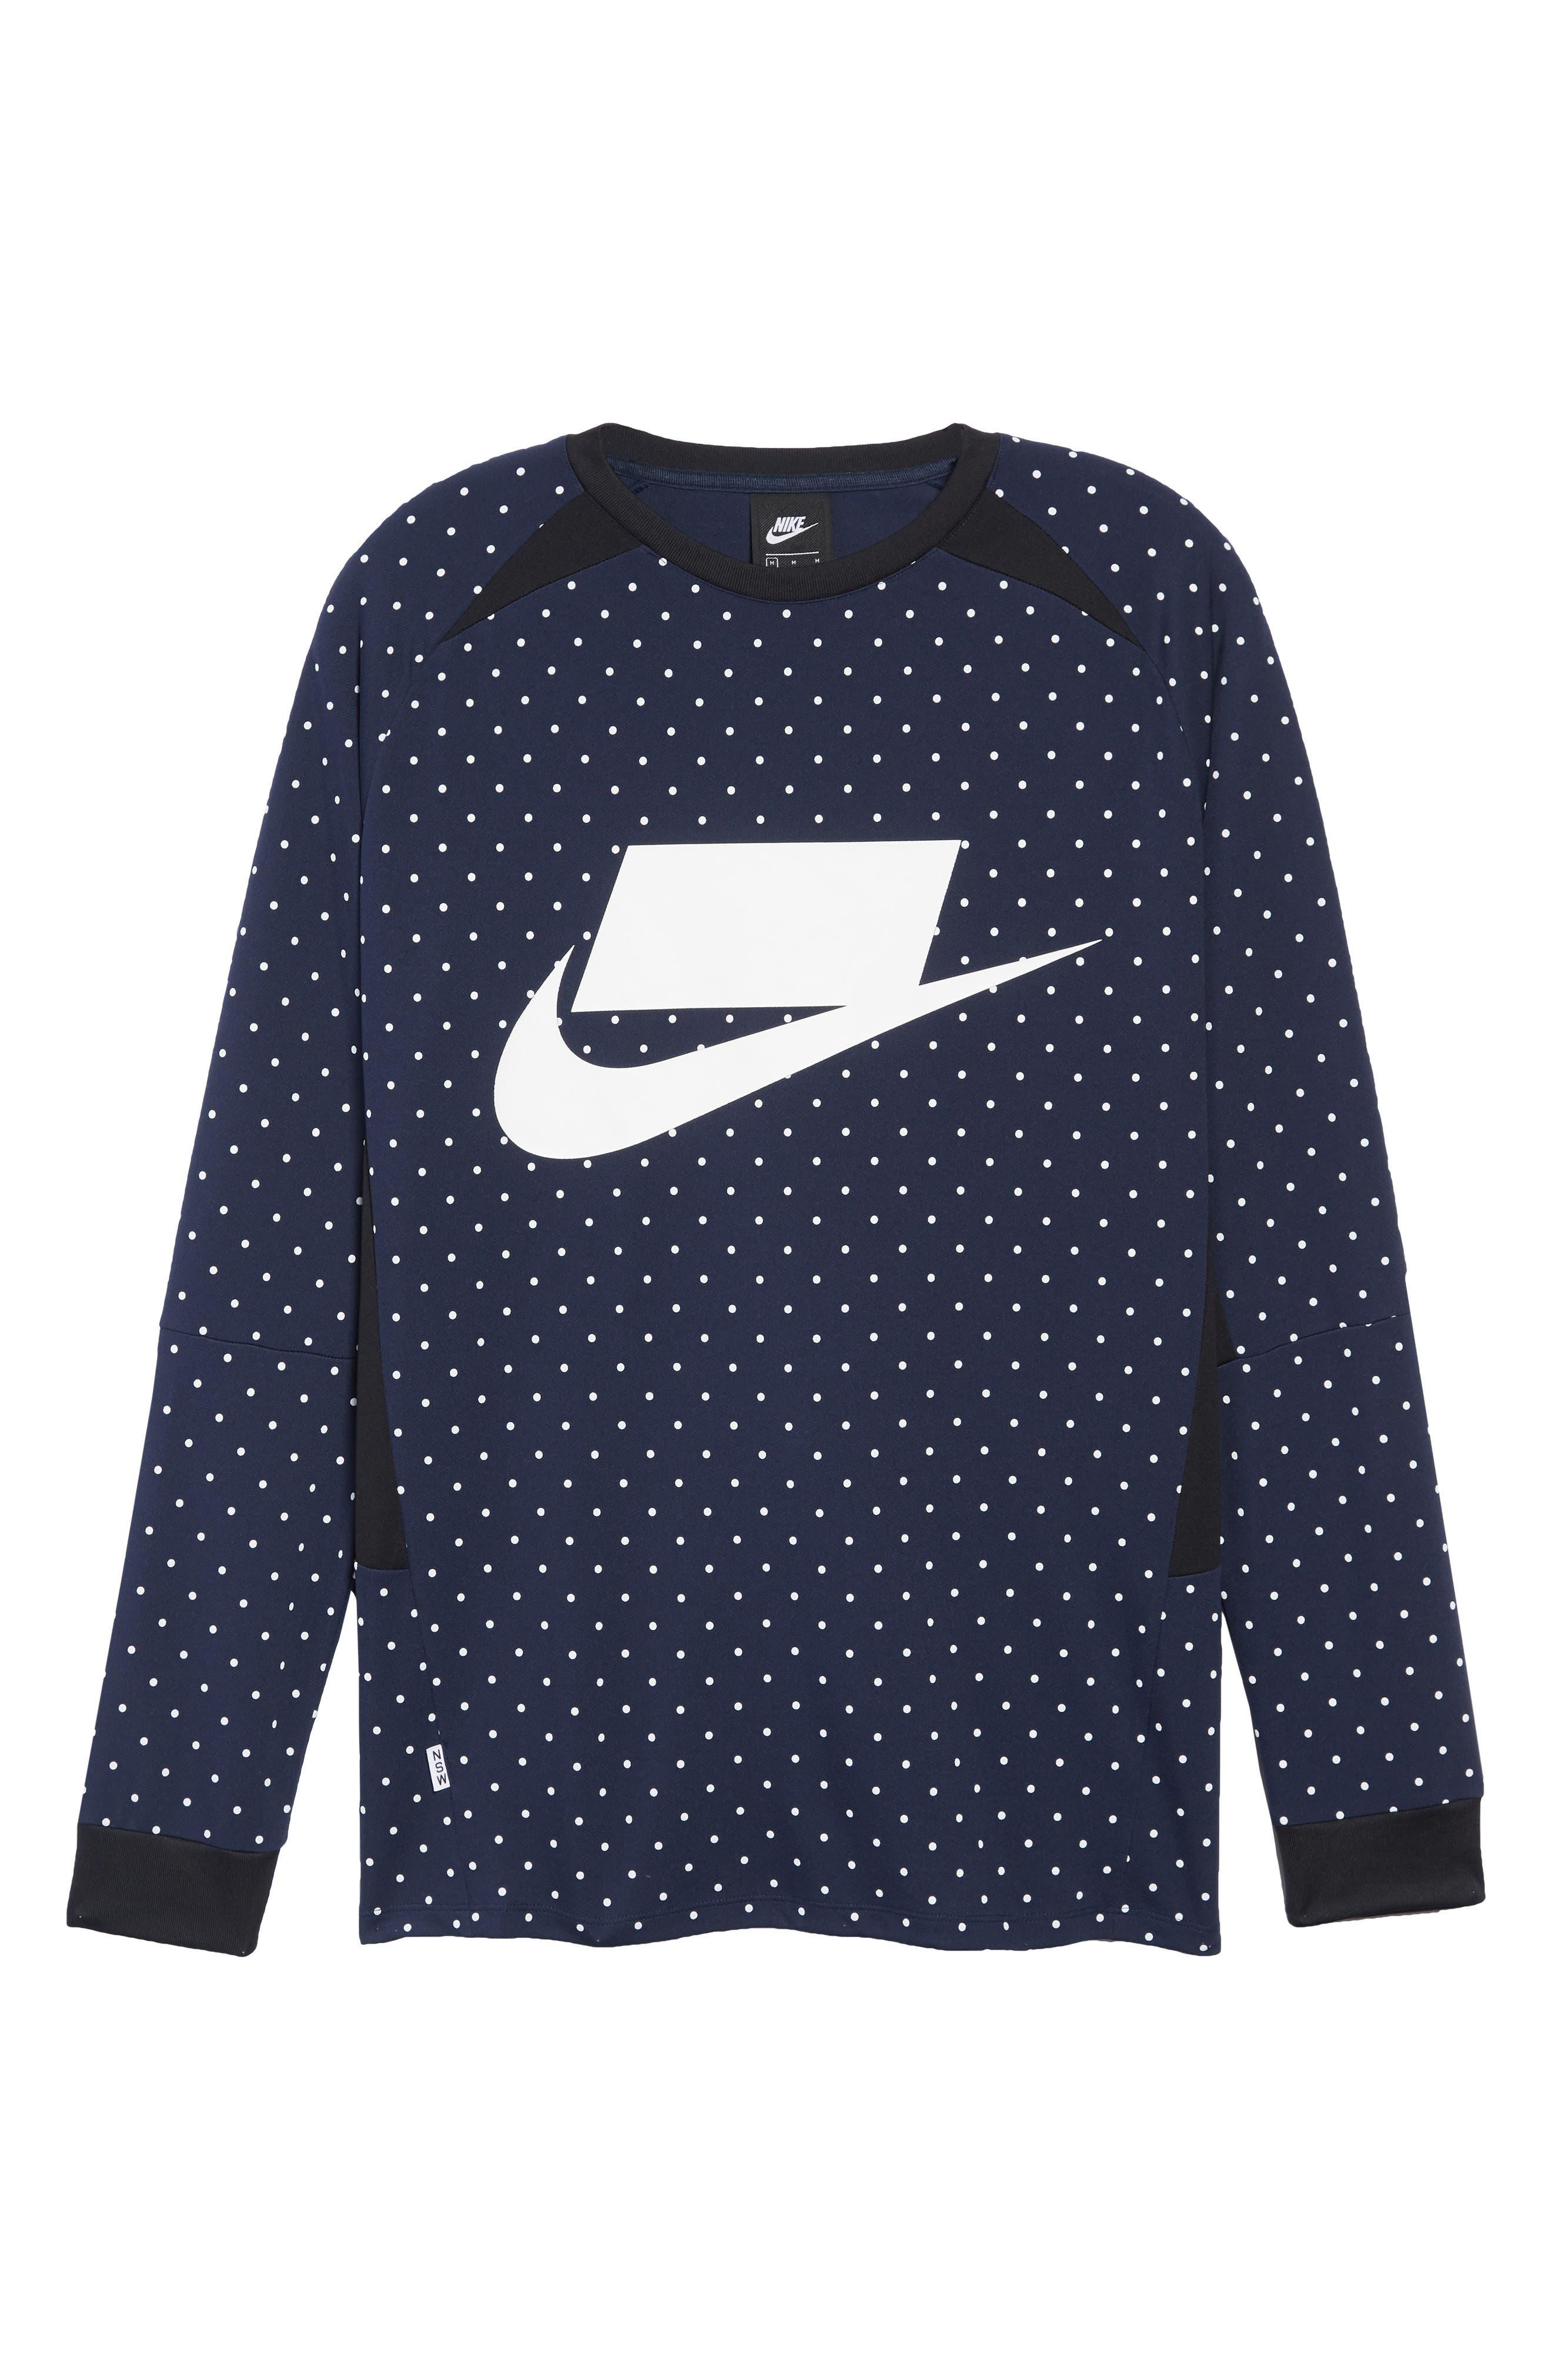 NSW Long Sleeve Shirt,                             Alternate thumbnail 6, color,                             451